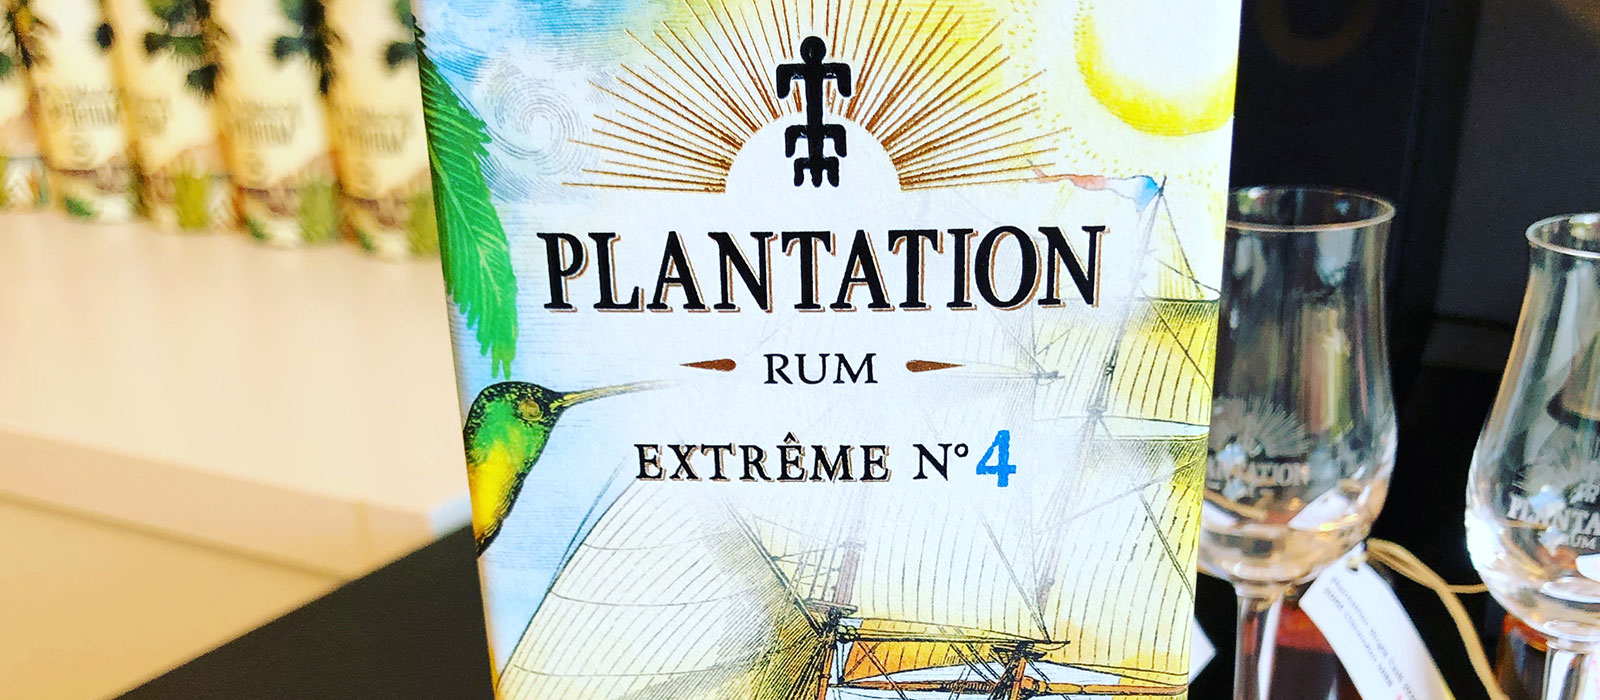 Silver 2020: Plantation Extrême no.4 Guyana Uitvlugt 1993